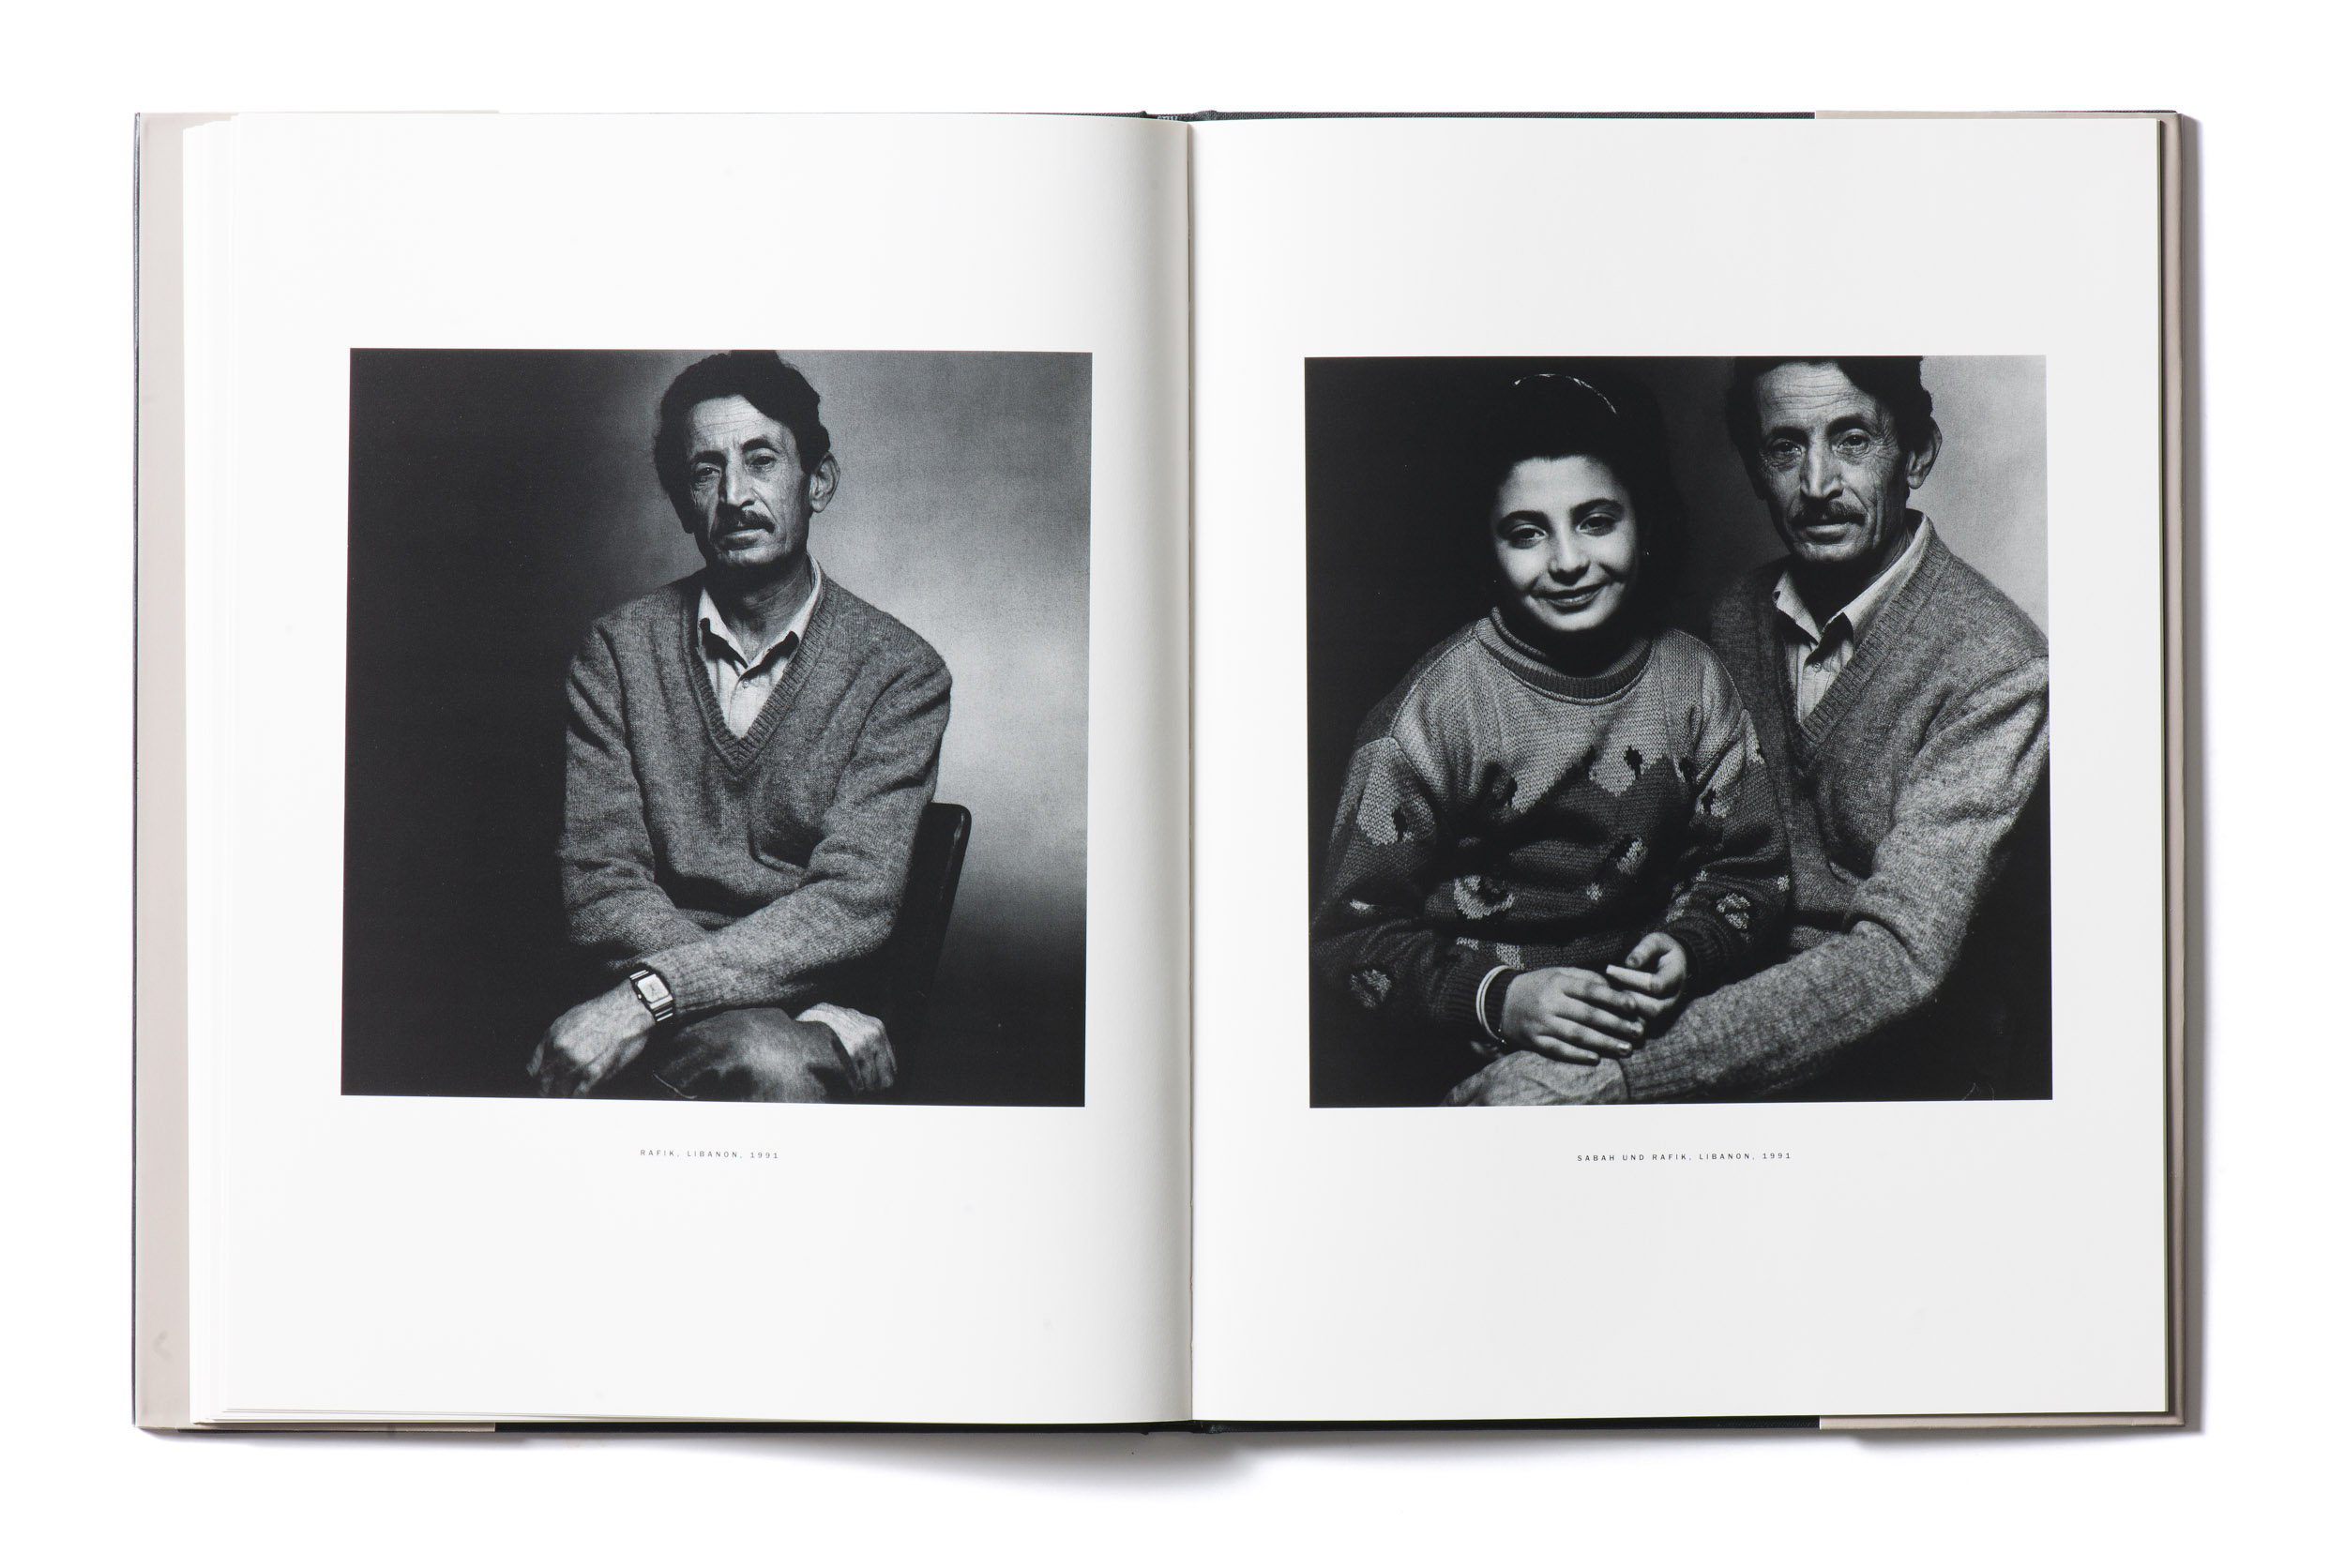 Kunstband Fotografien Peter Hebeisen Titel Feindbilder #9